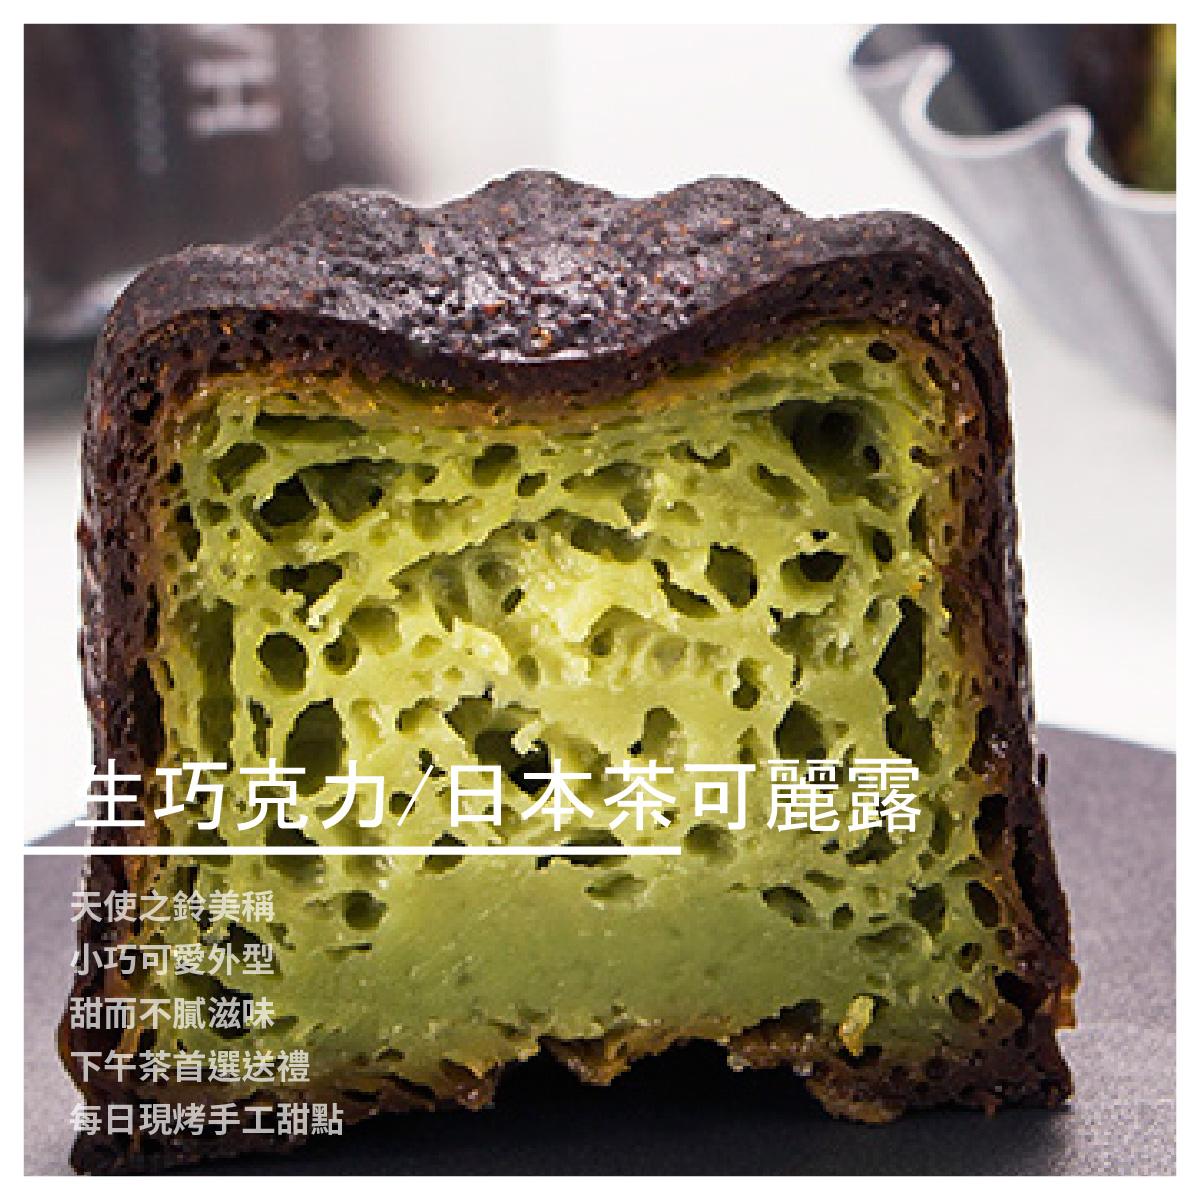 【DelleBakery可麗露專賣店】生巧克力可麗露/日本茶可麗露/6顆/兩款口味